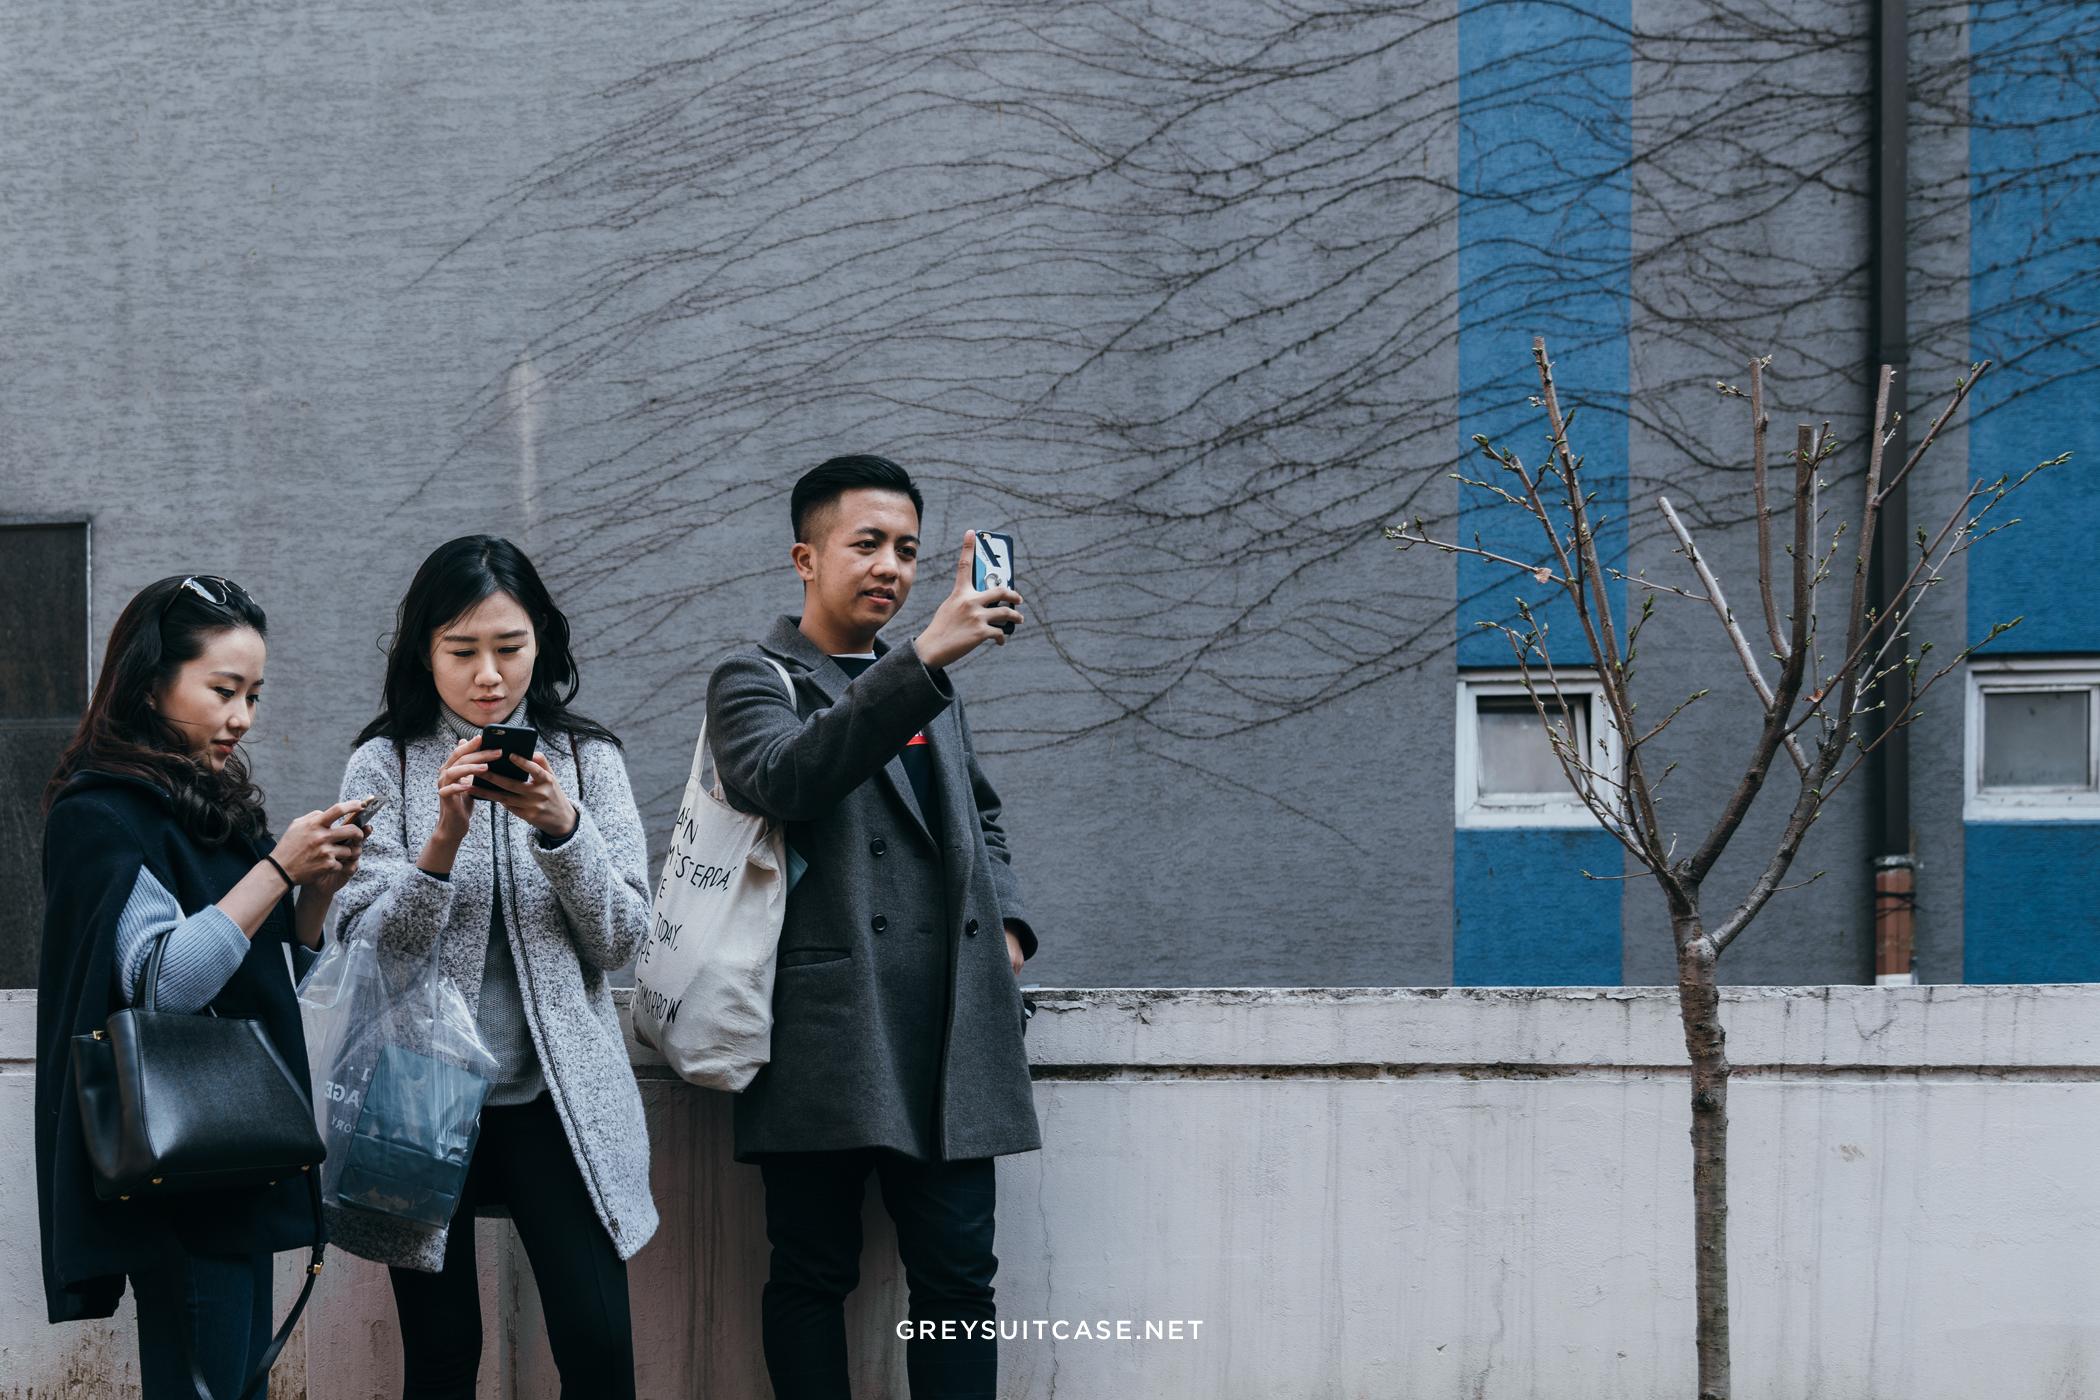 Greysuitcase Travel Series - Seoul Spring '17 - Villa Soohyang, Garosugil (가로수길), Seoul, South Korea